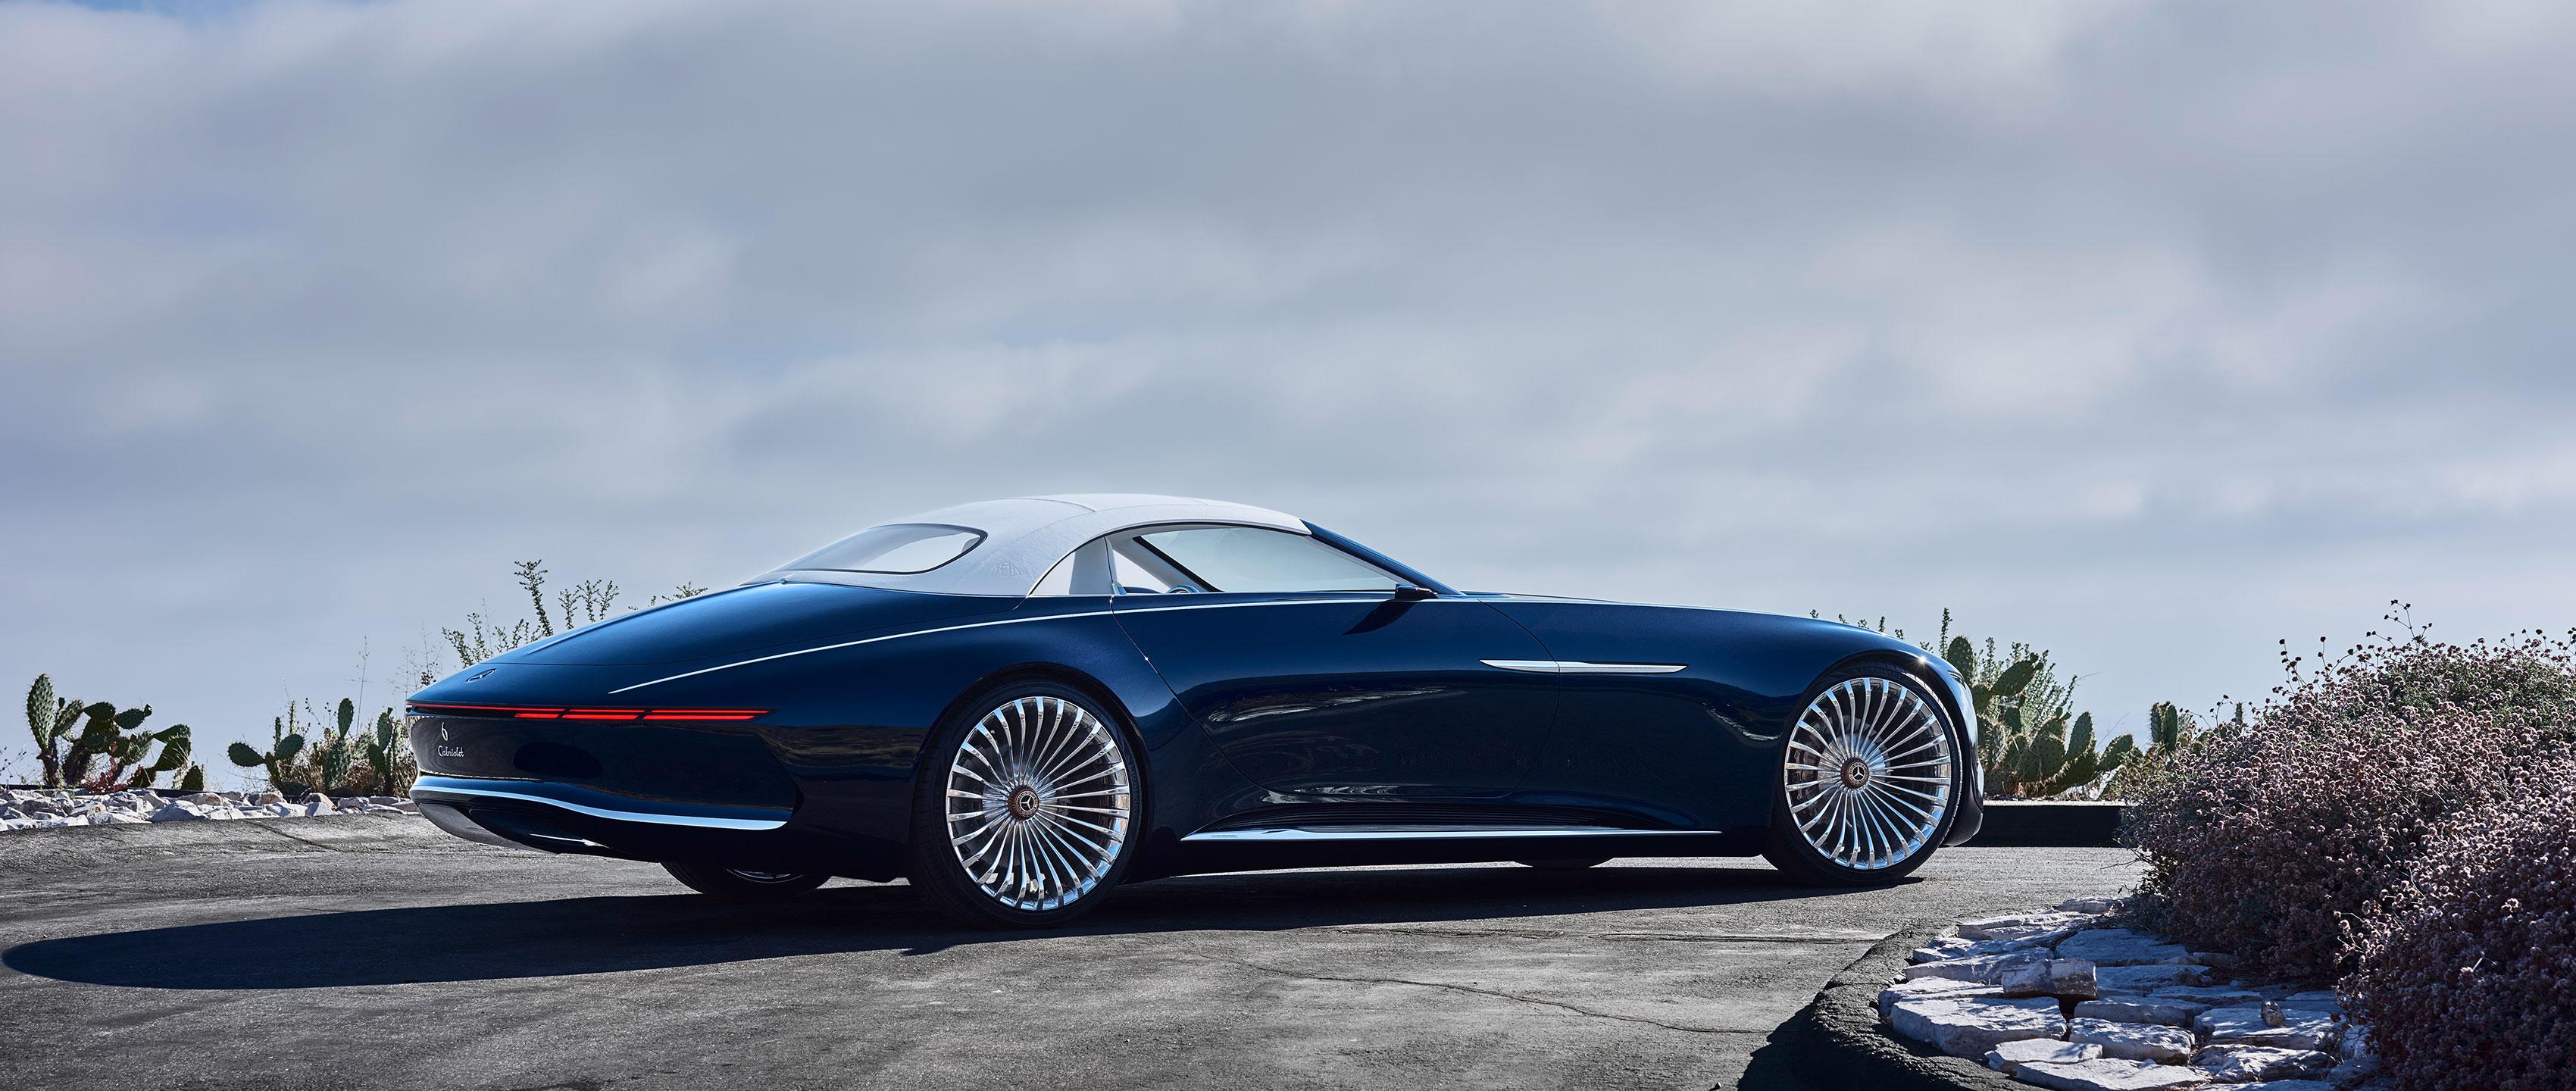 [Image: Vision-Mercedes-Maybach-6-Cabriolet-2.jpg]